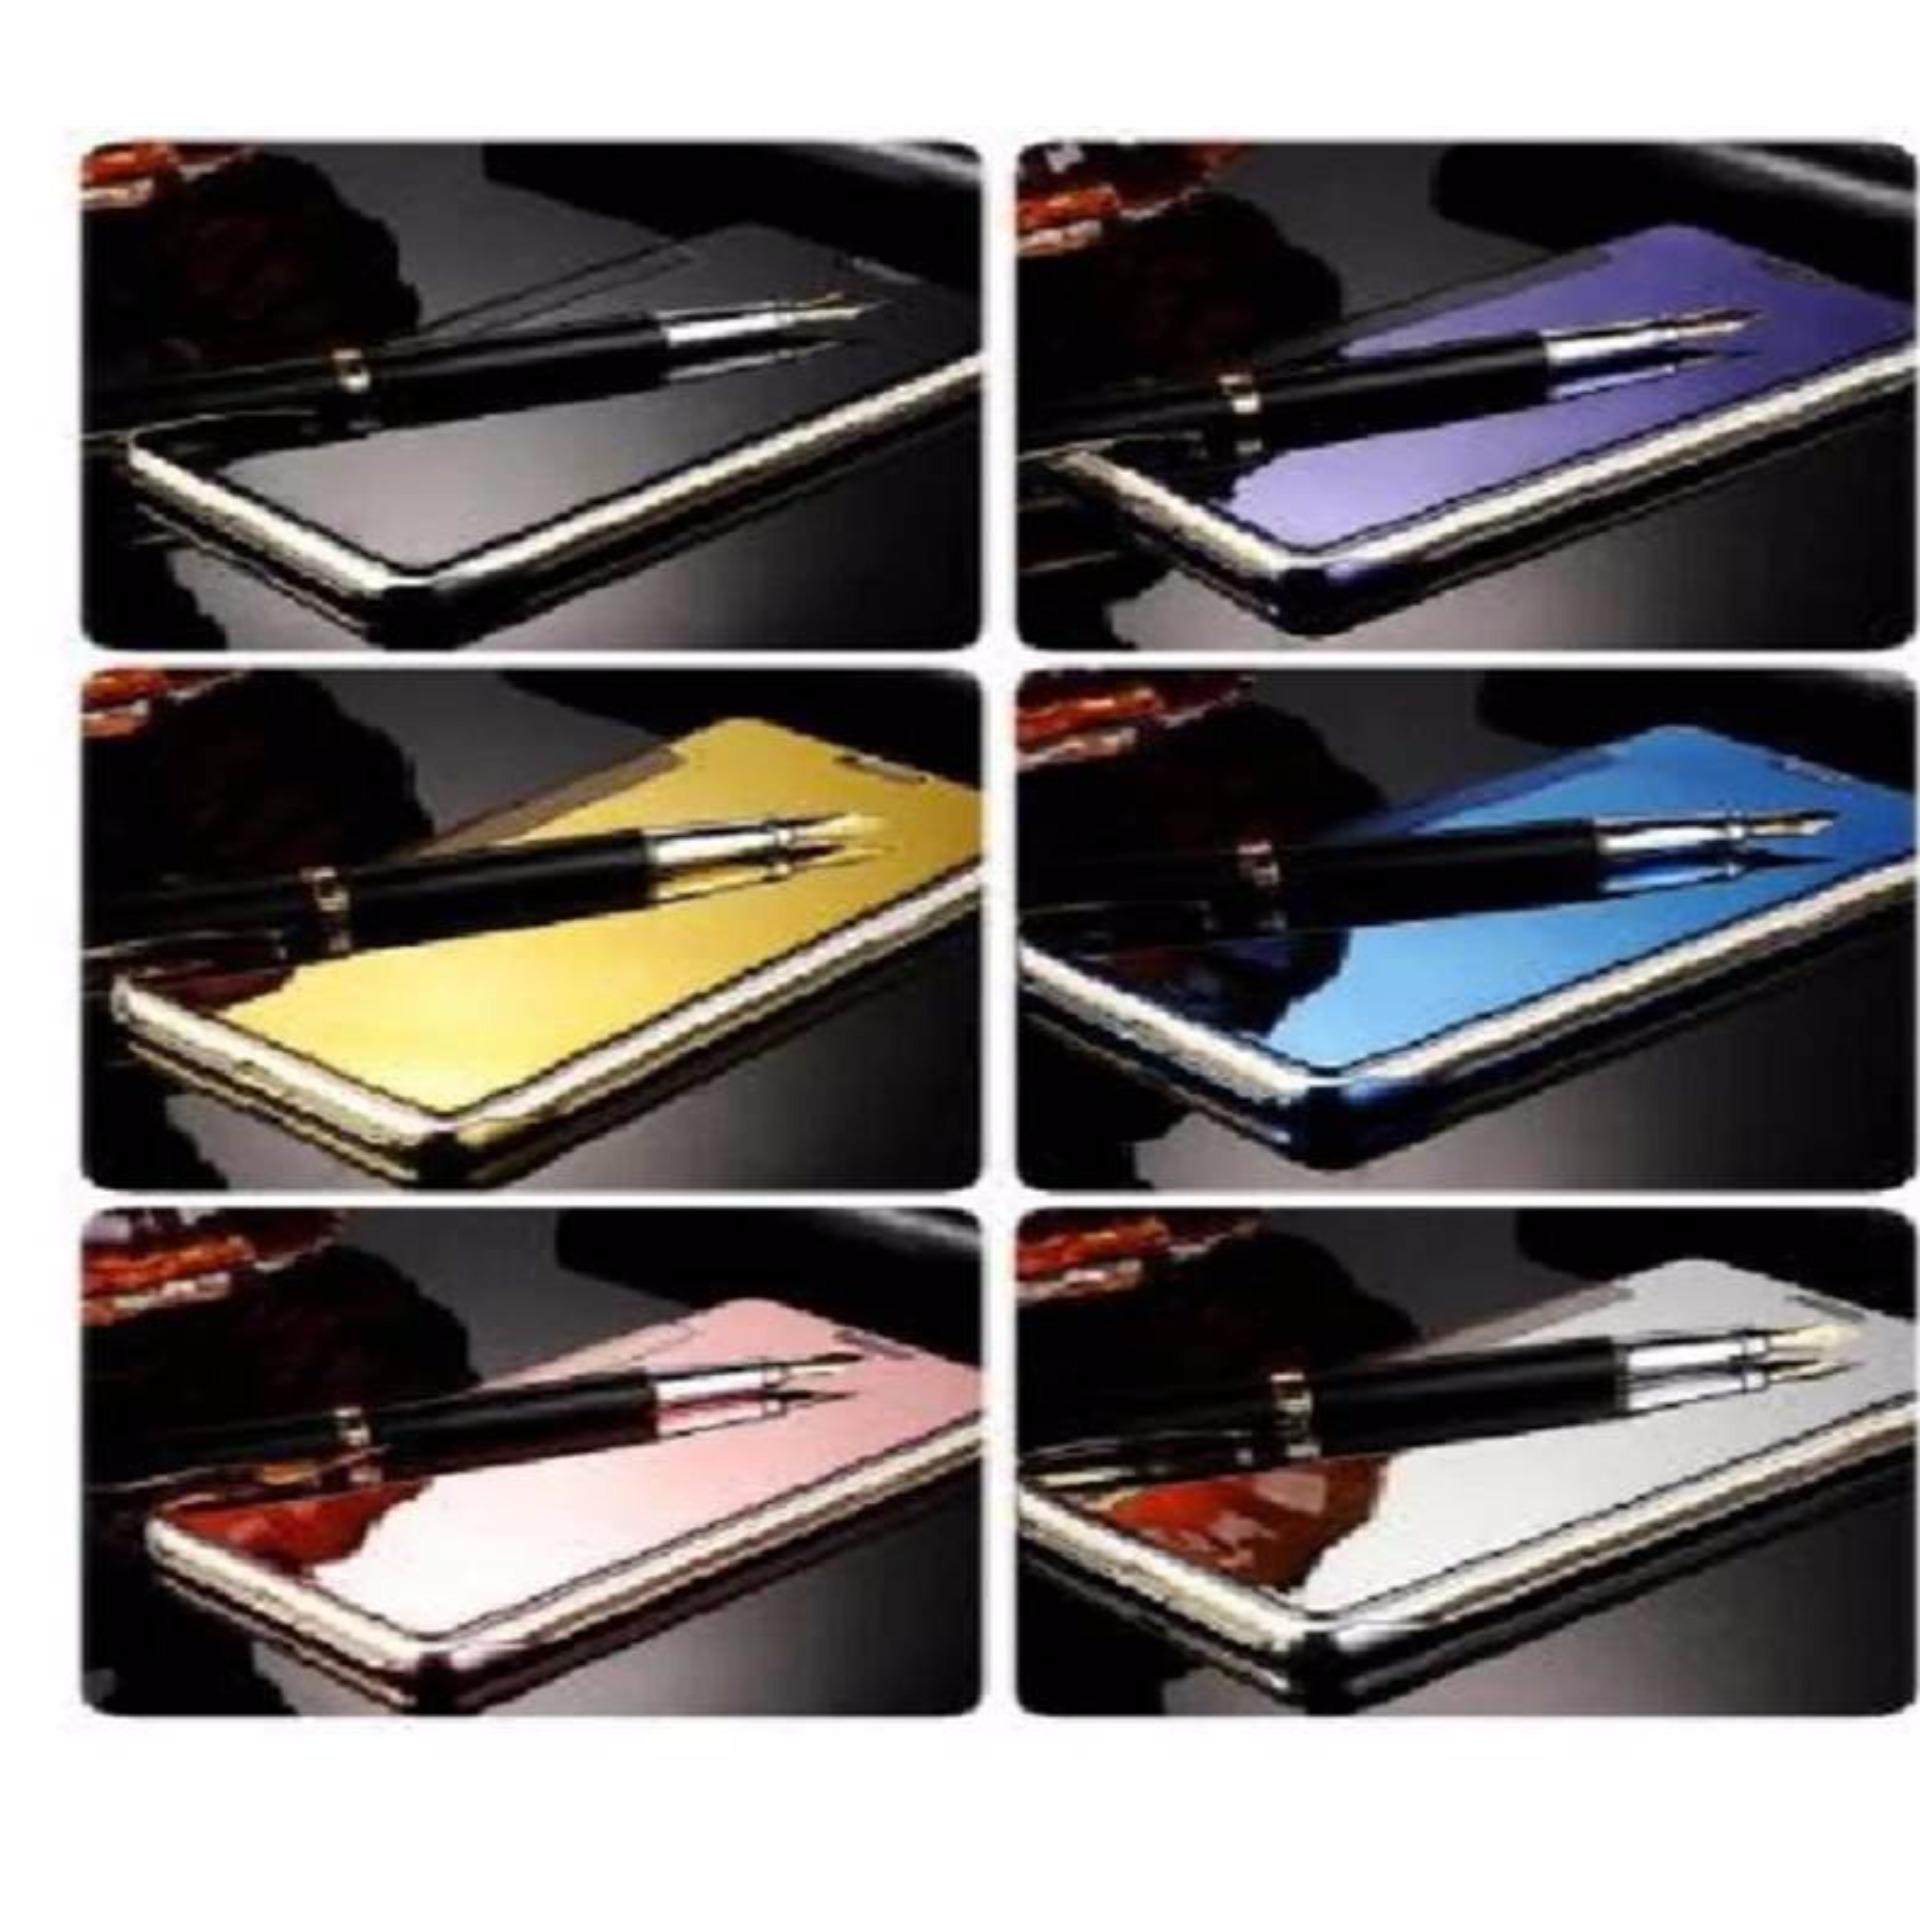 ... Case Samsung Galaxy A5 2016 Flipcase Flip Mirror Cover S View Transparan Auto Lock Casing Hp